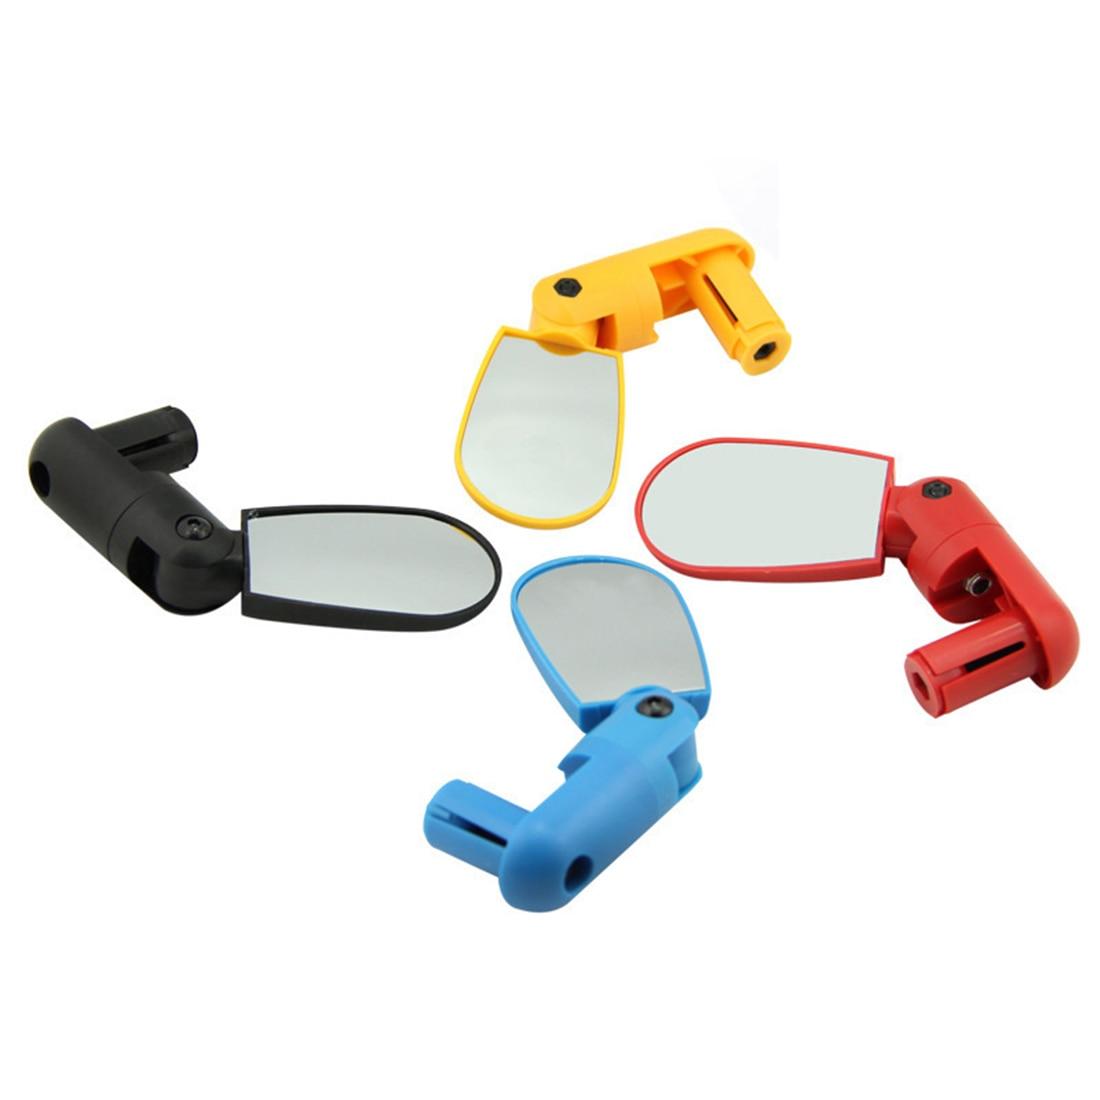 bike accessories Cycling bike bicycle mirror Universal Adjustable rear view mirror mountain bike handlebar Rearview Mirror